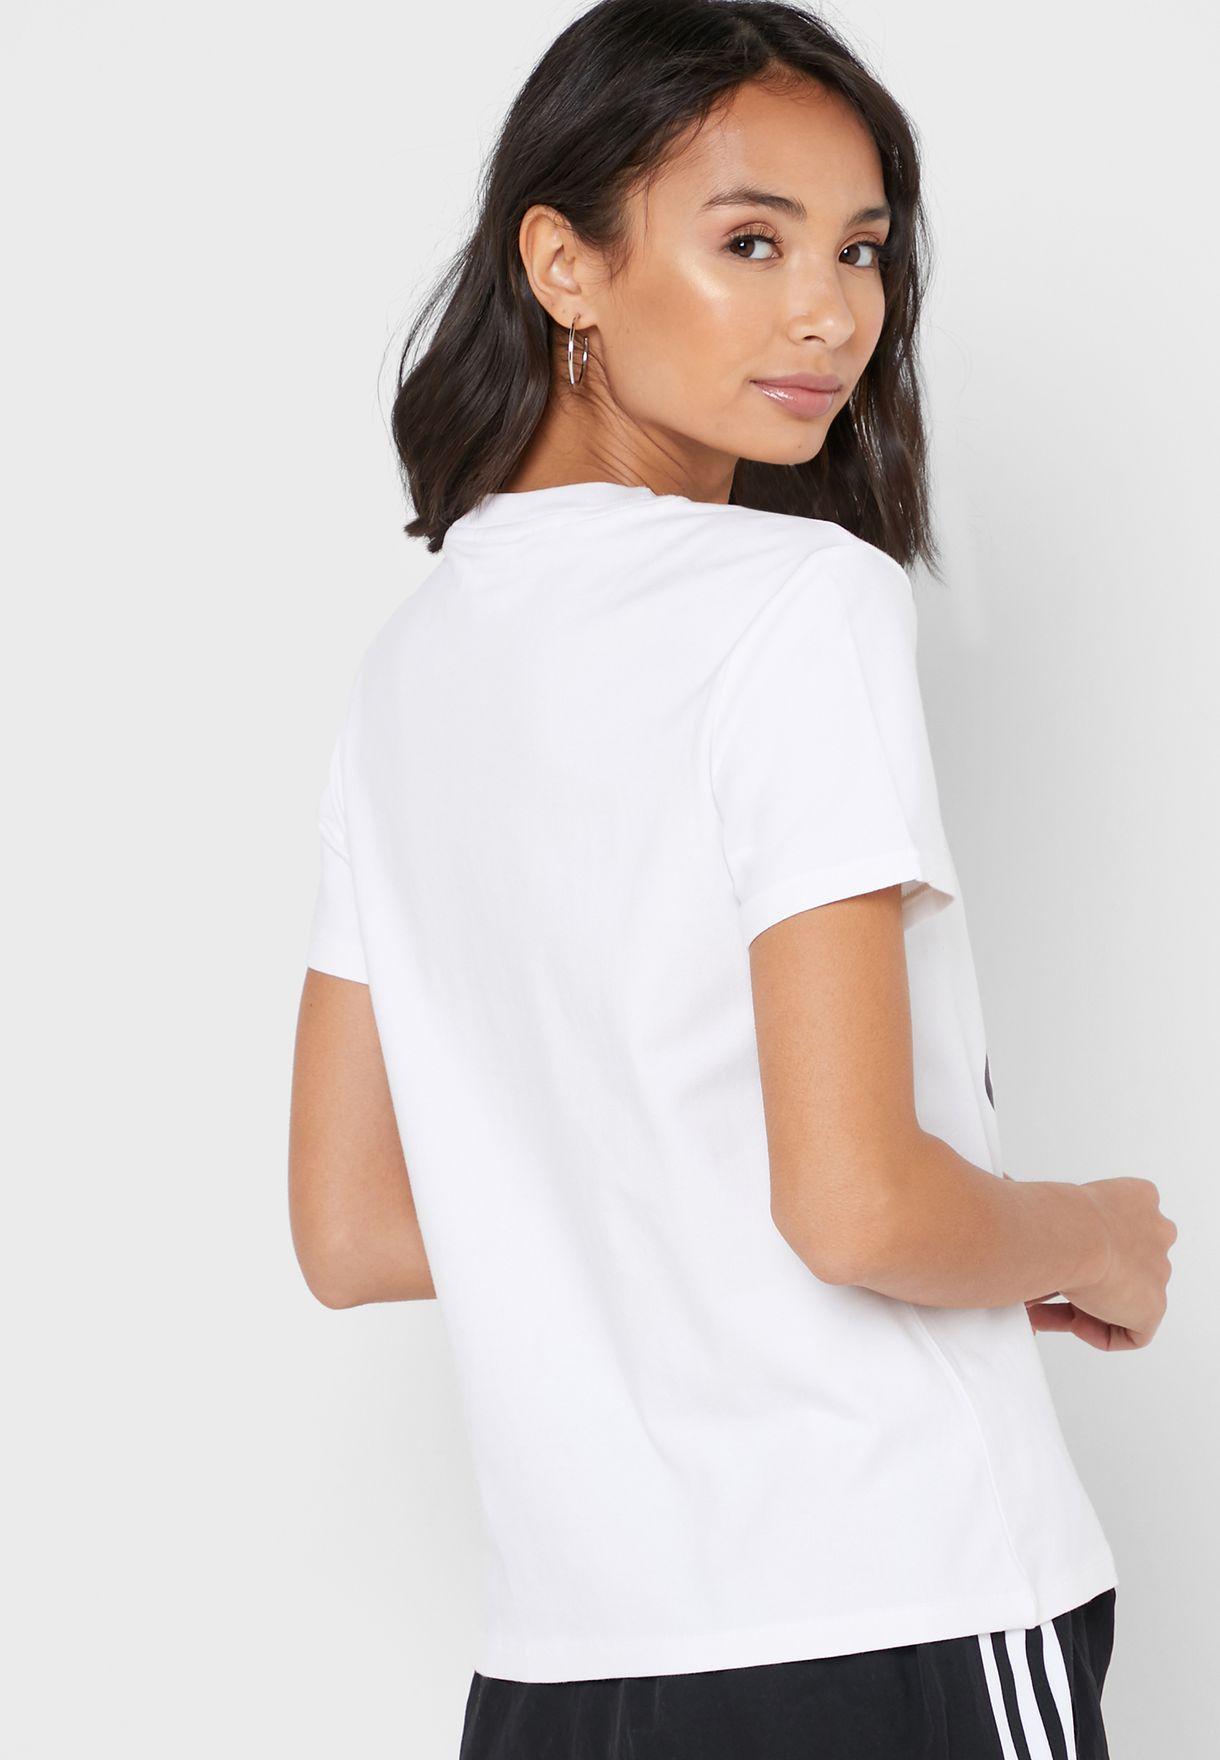 Trefoil Adicolor Casual Women's T-Shirt